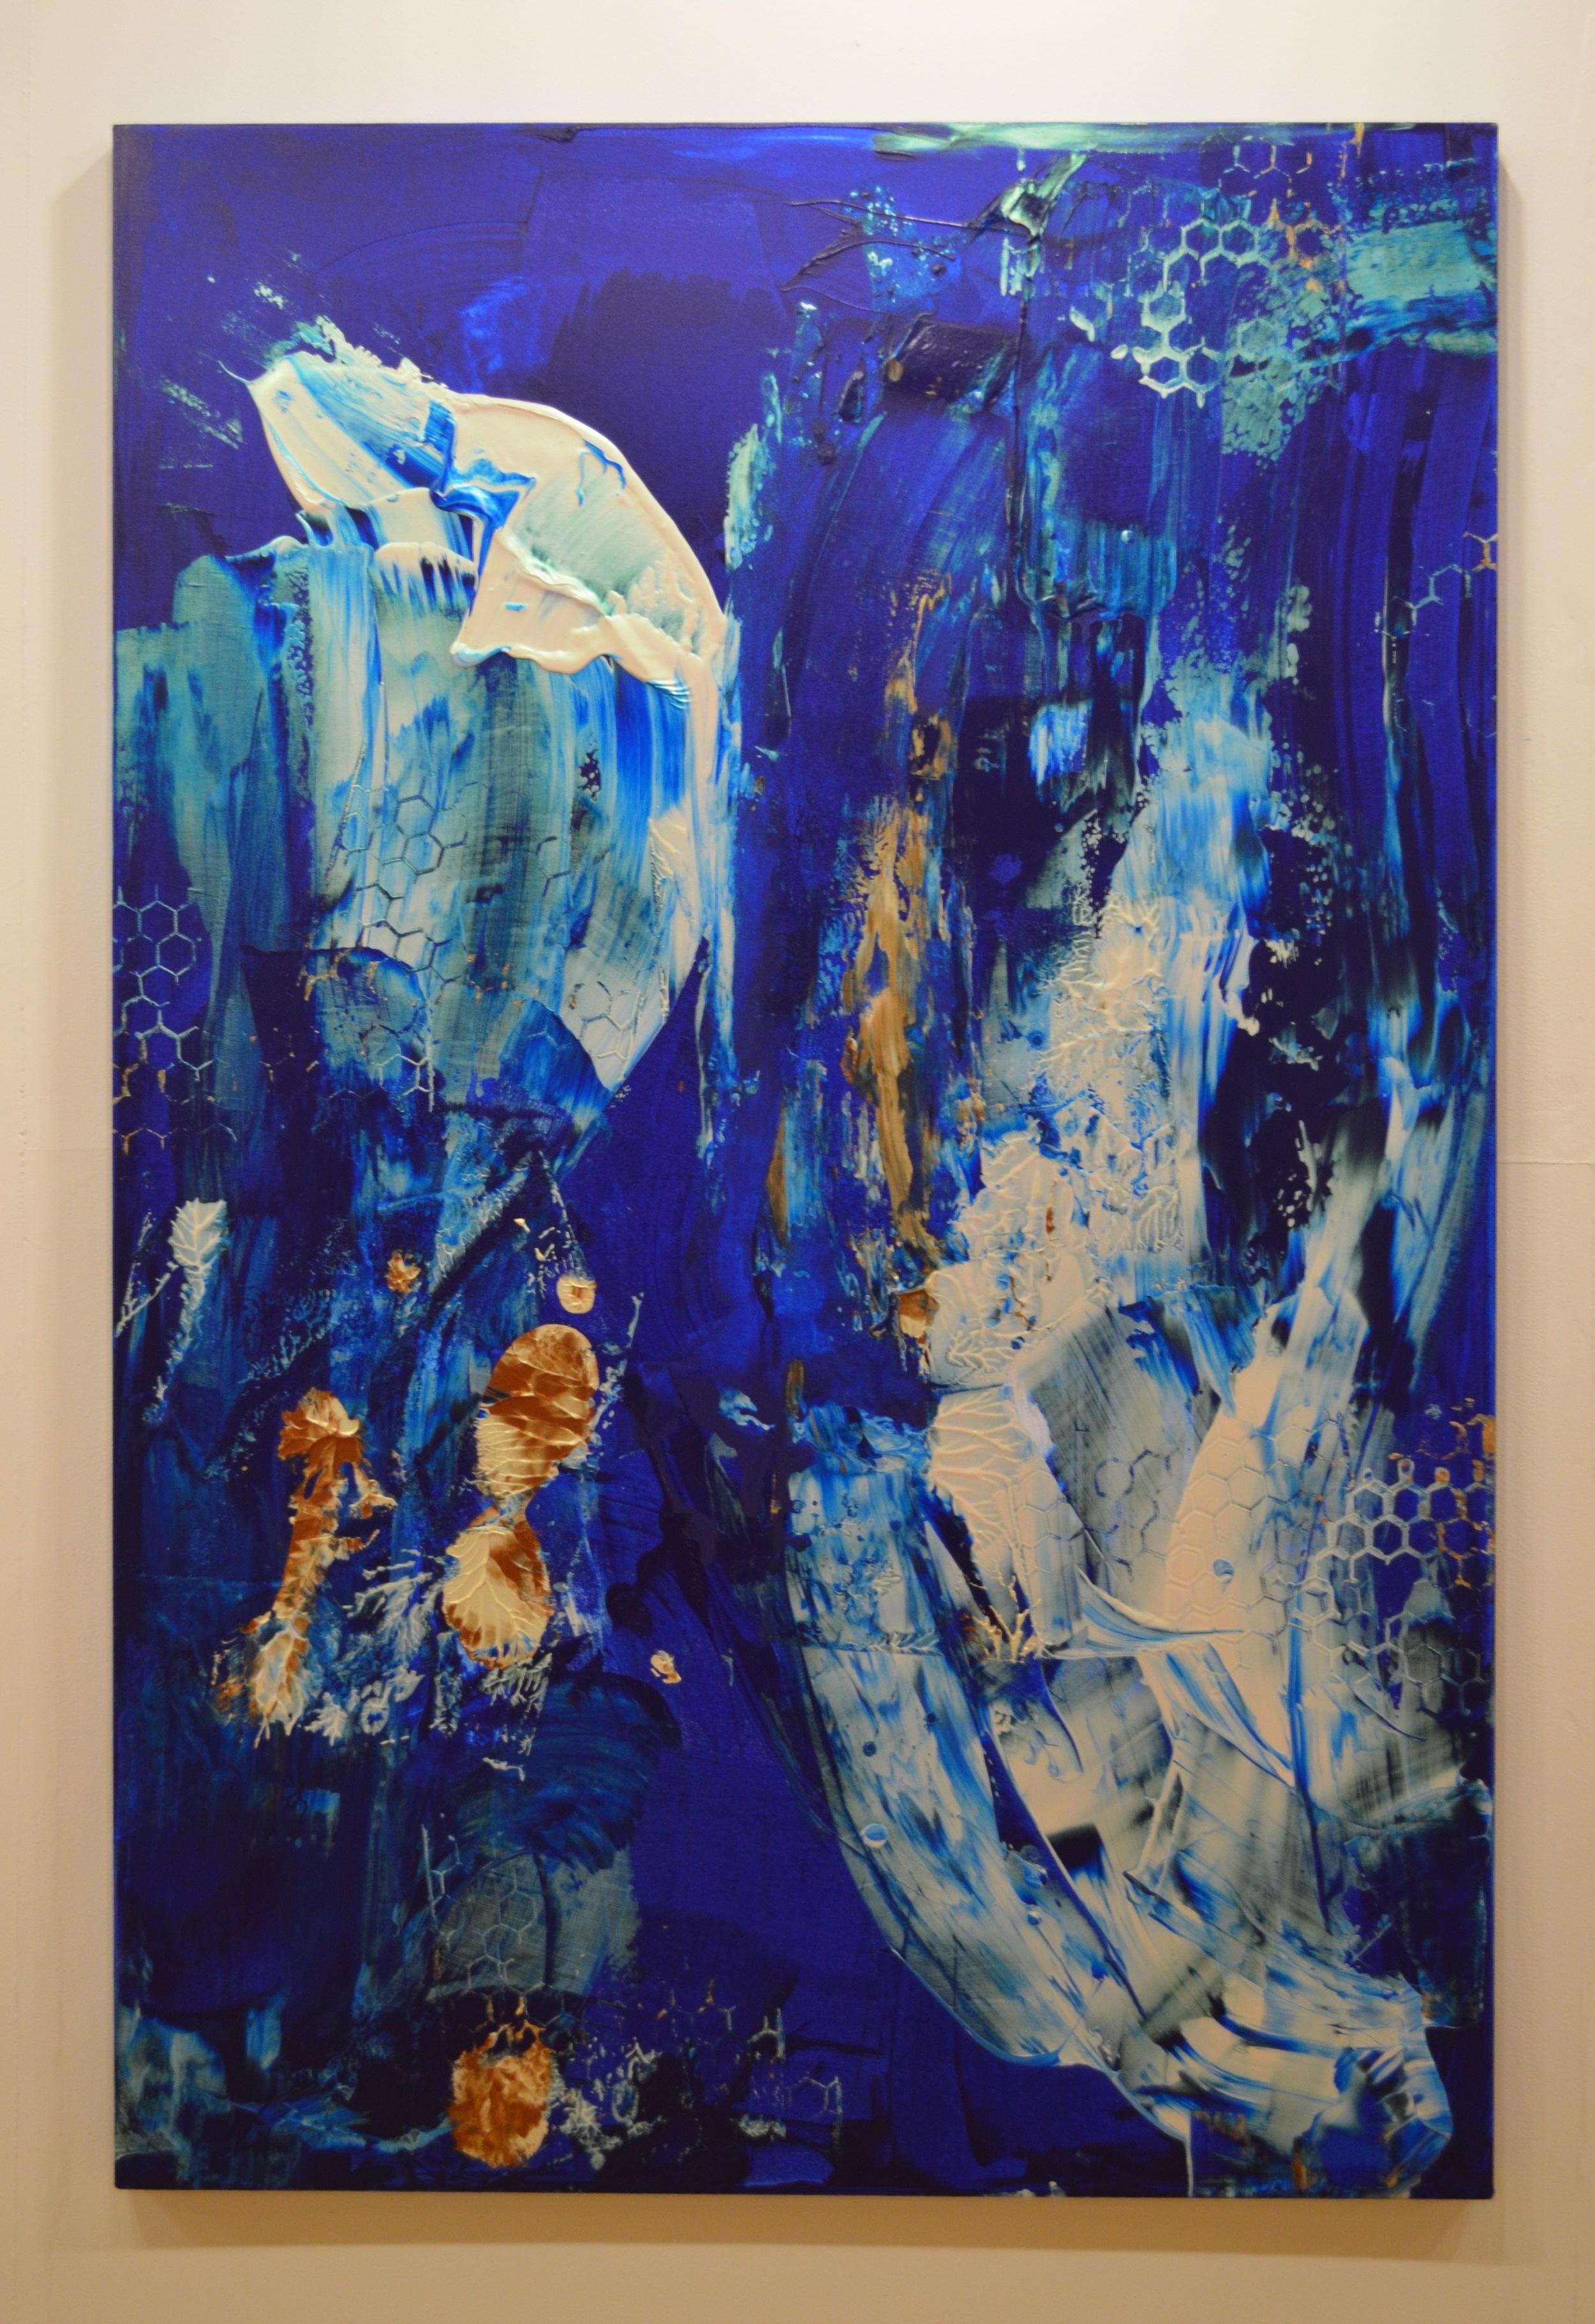 9. Deep Dive, Natasha Shoro, 72 x 48 inches, $6,500